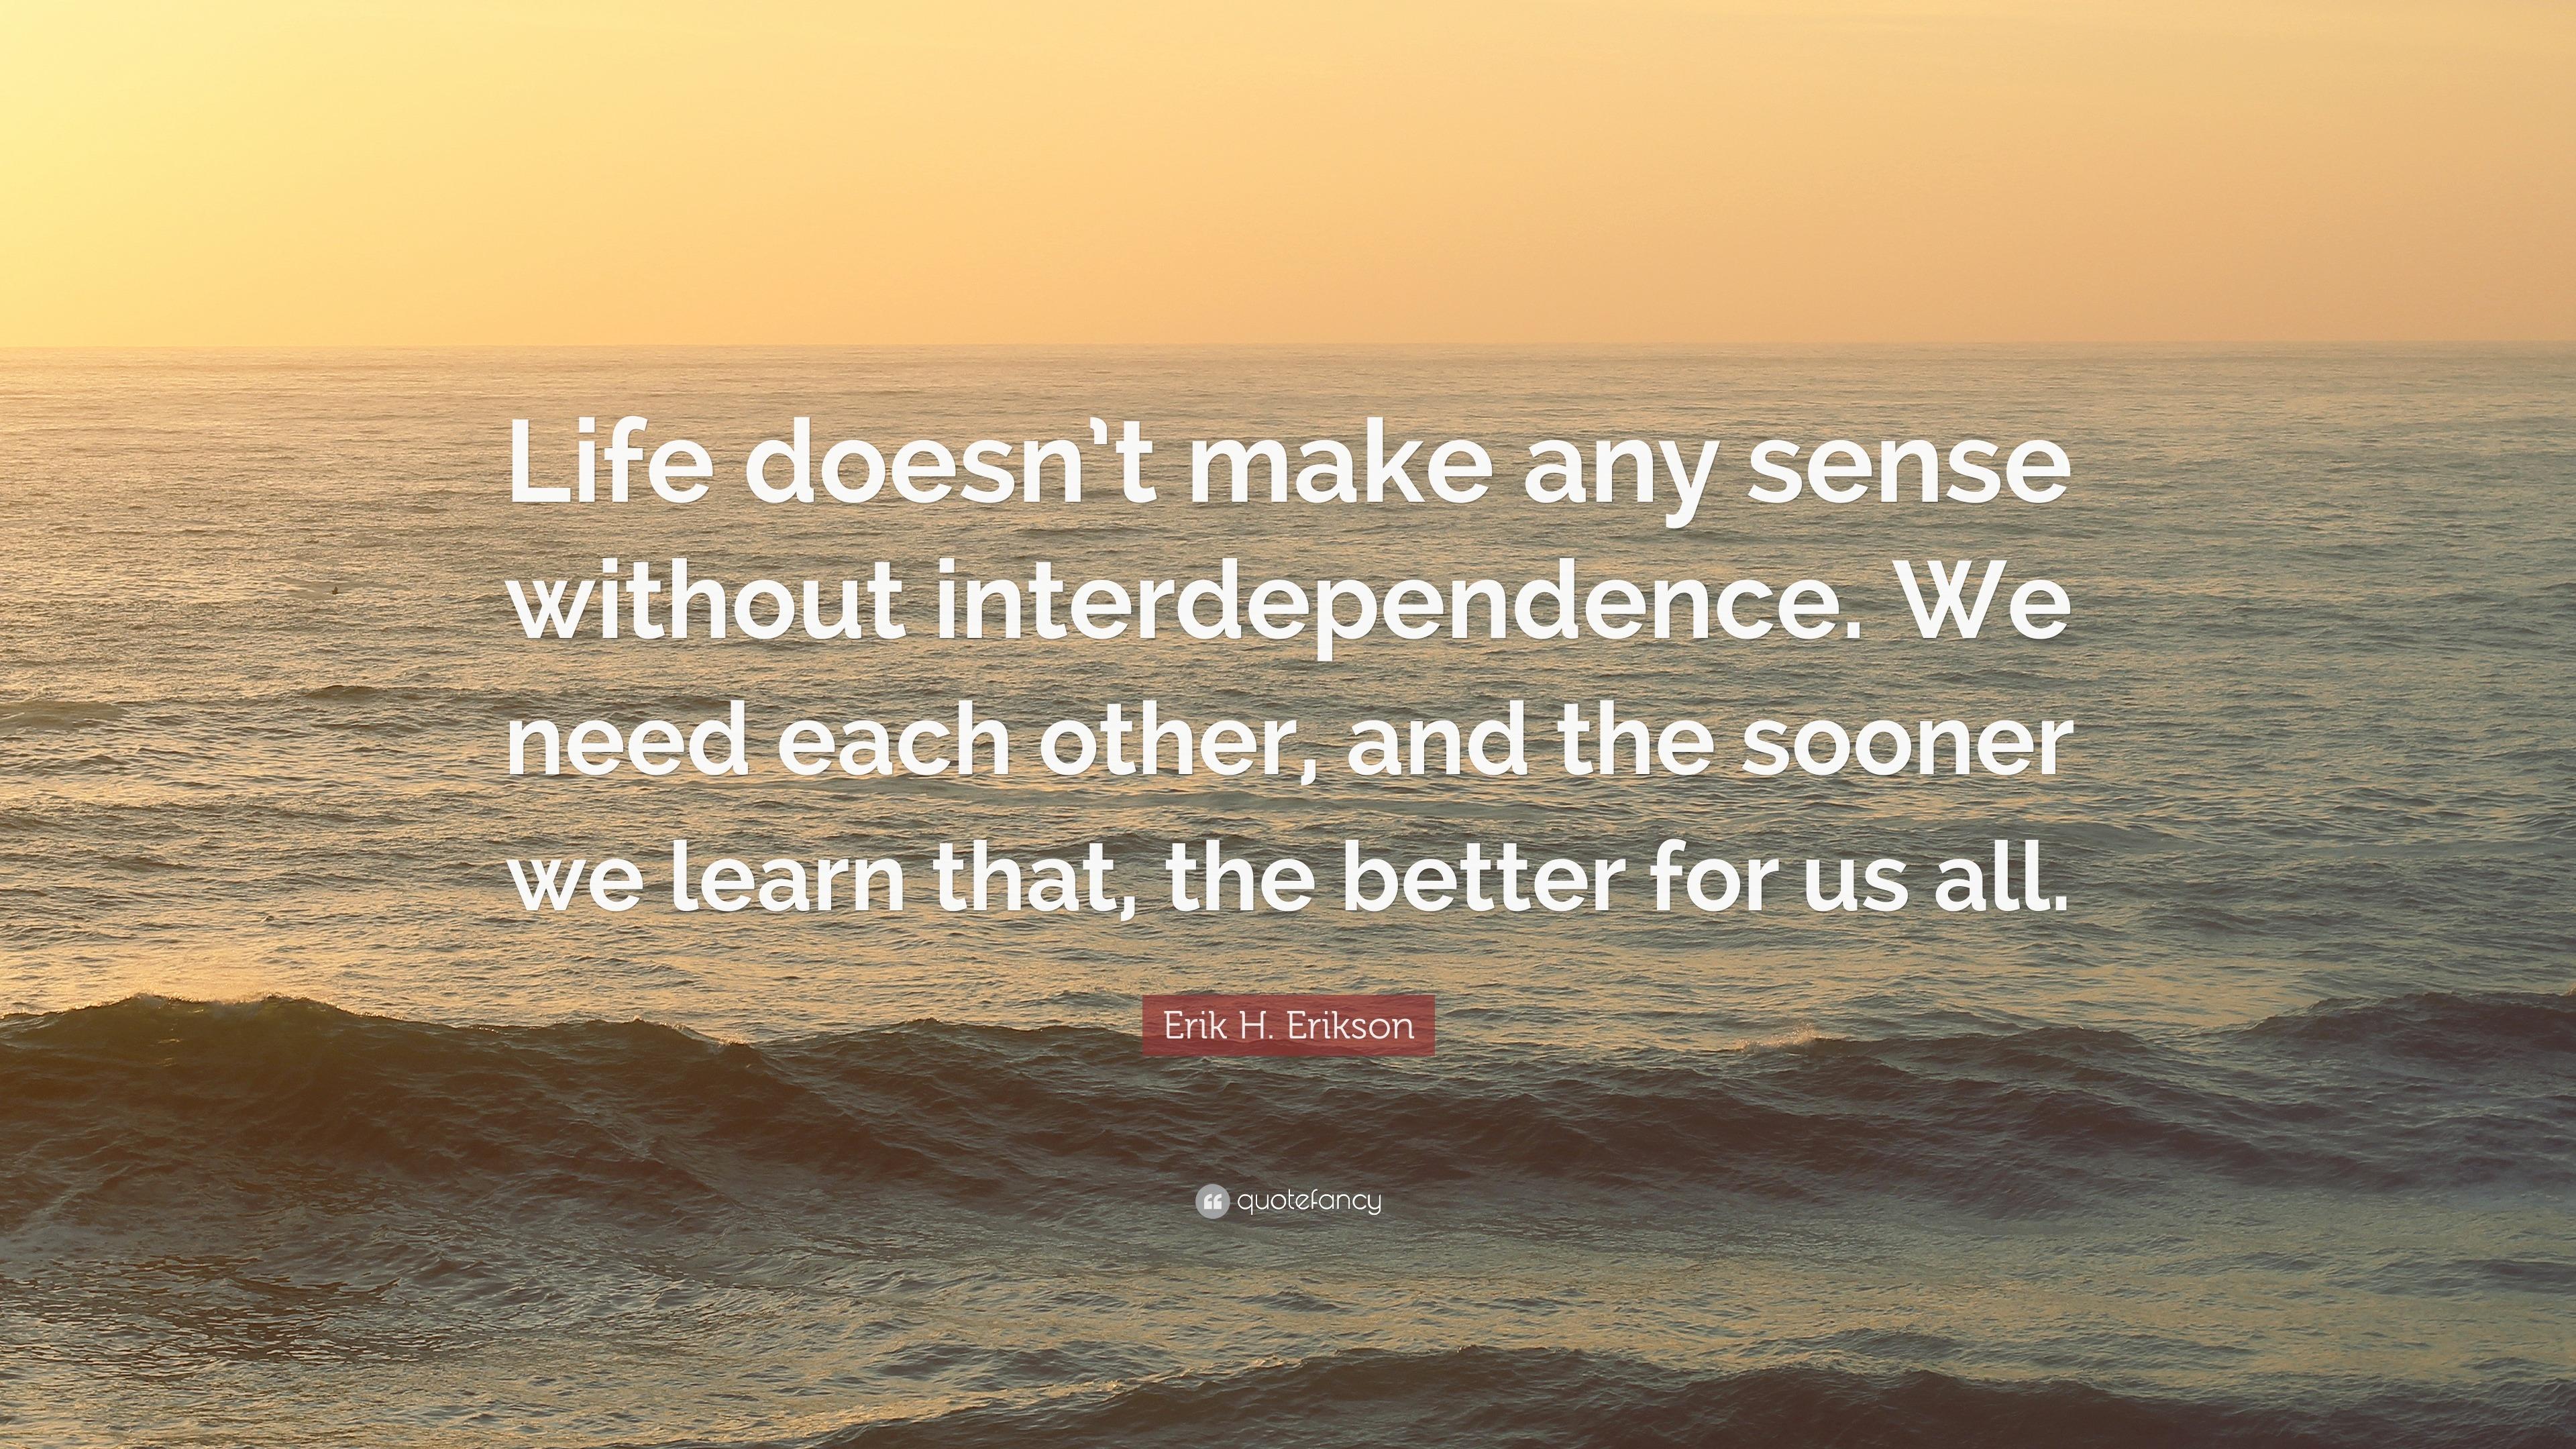 Erik H Erikson Quote Life Doesnt Make Any Sense Without